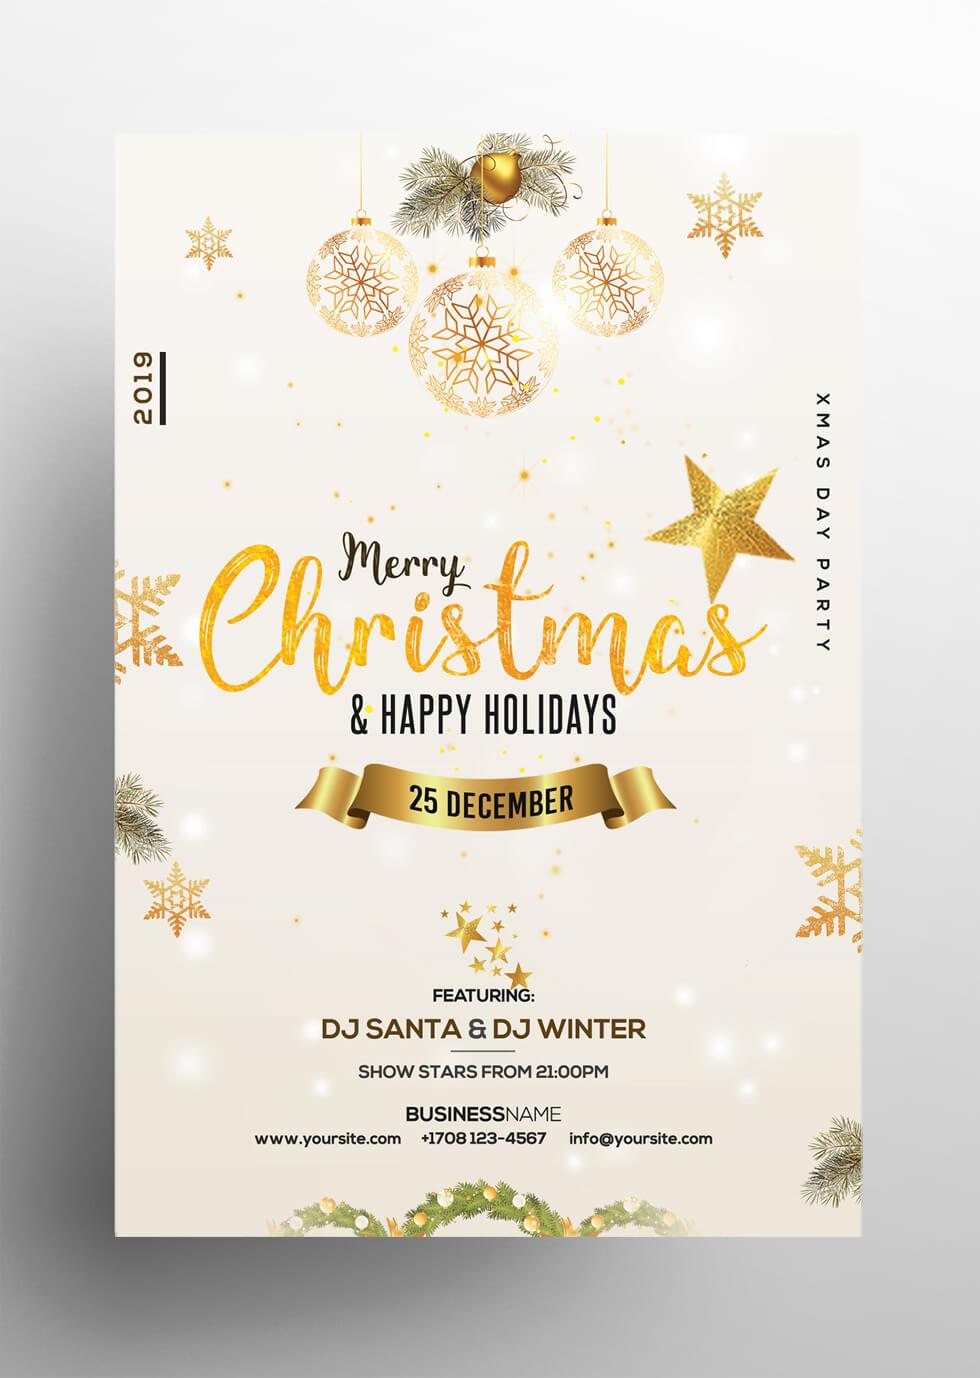 Christmas & Holiday – Free Invitation & Flyer Psd Template Inside Christmas Brochure Templates Free